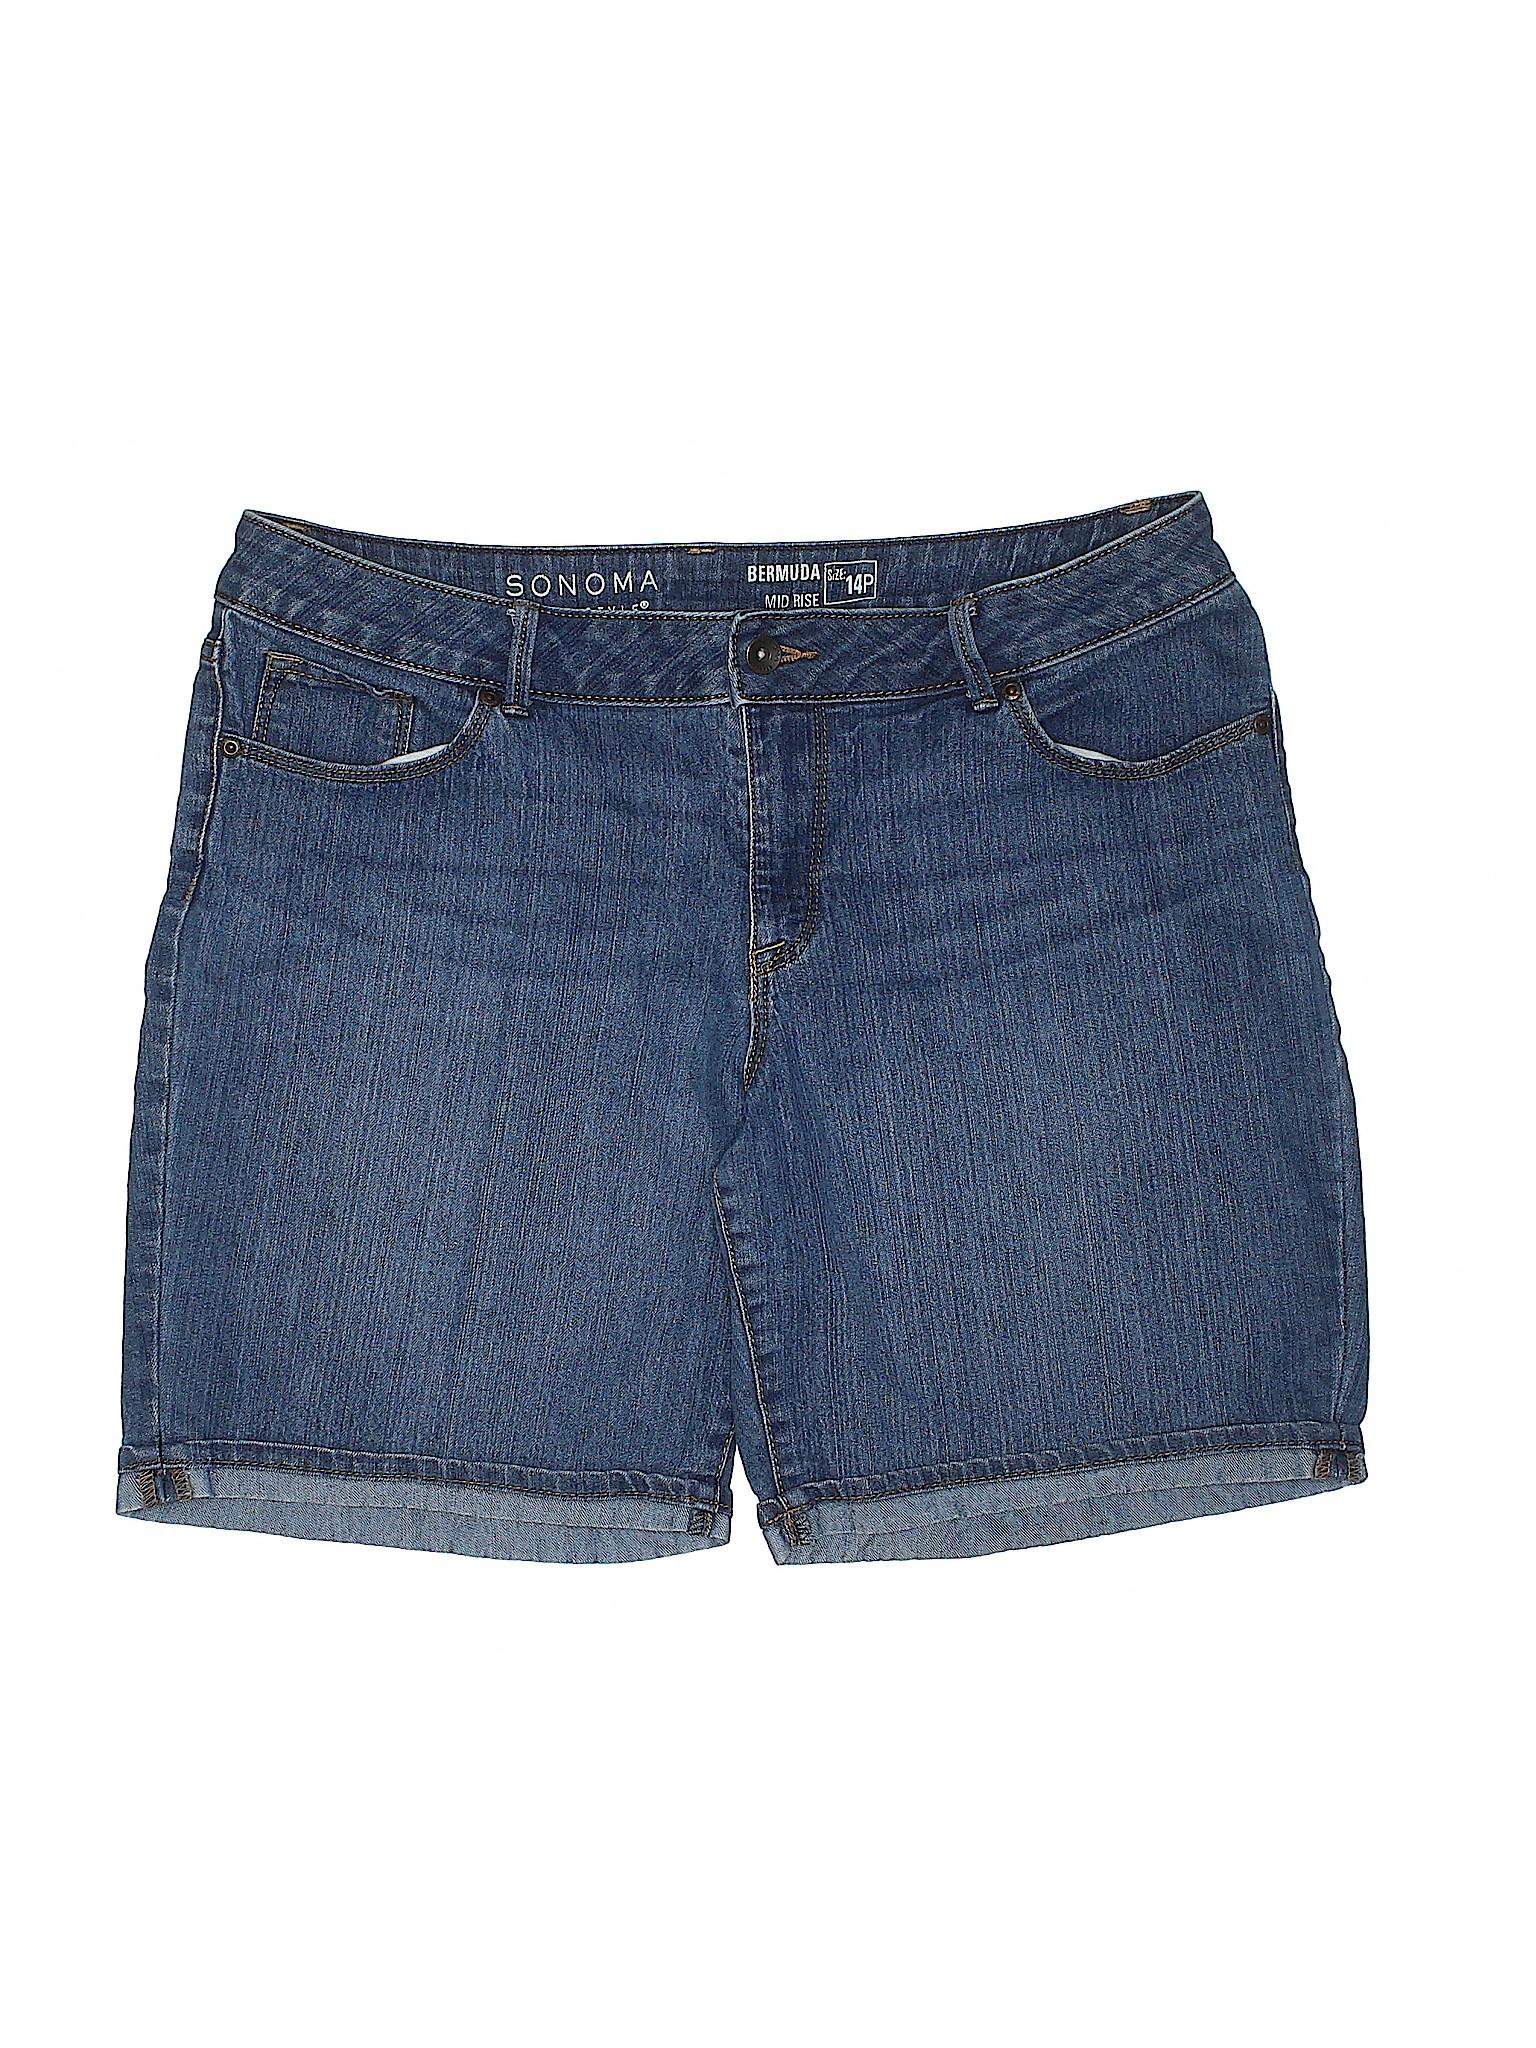 SONOMA Shorts Boutique Denim life style 4xqzqa0